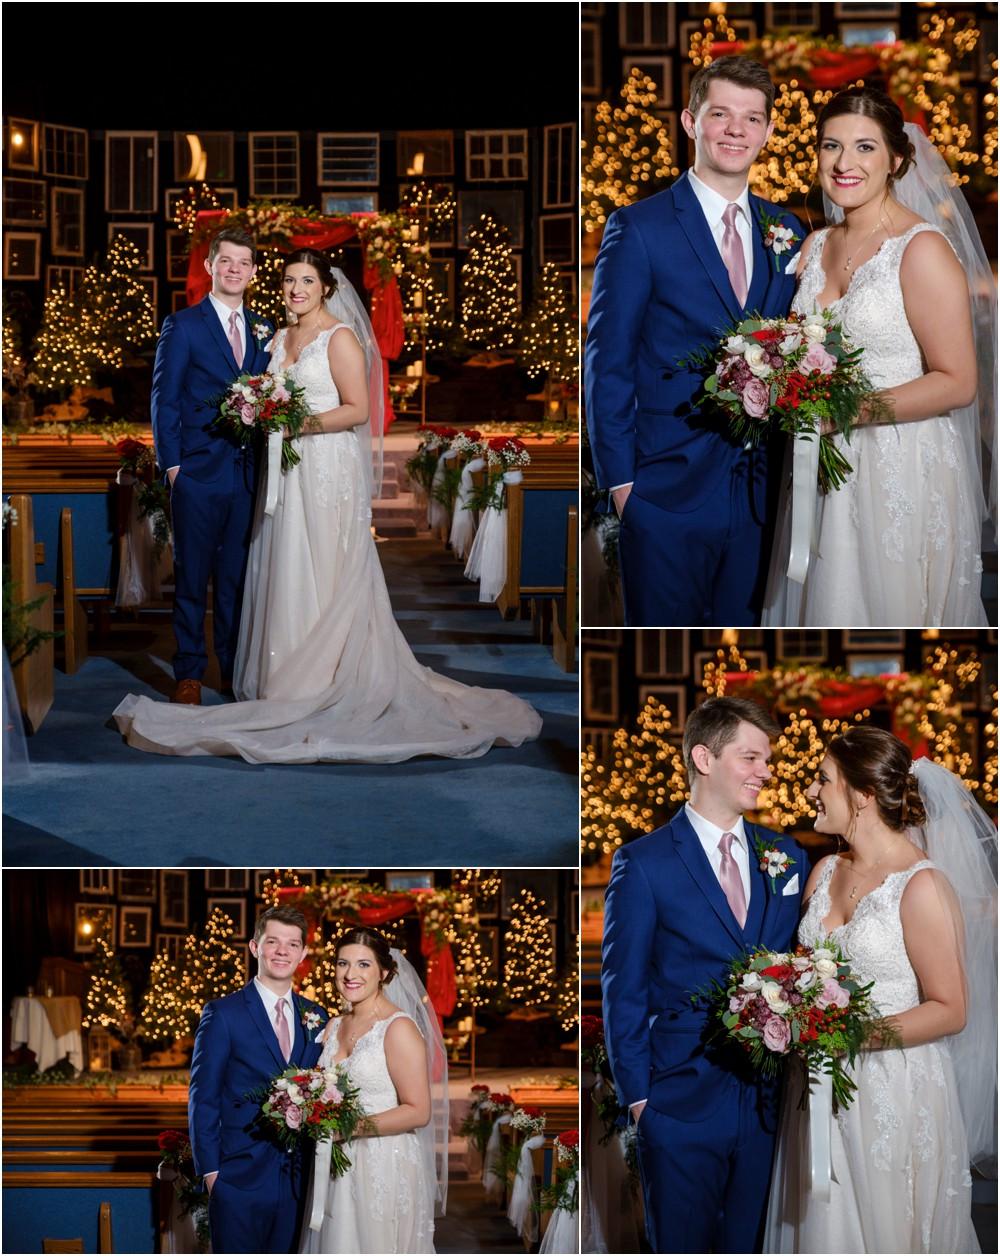 Washington-TownshipPark-Wedding-Pictures_0006.jpg